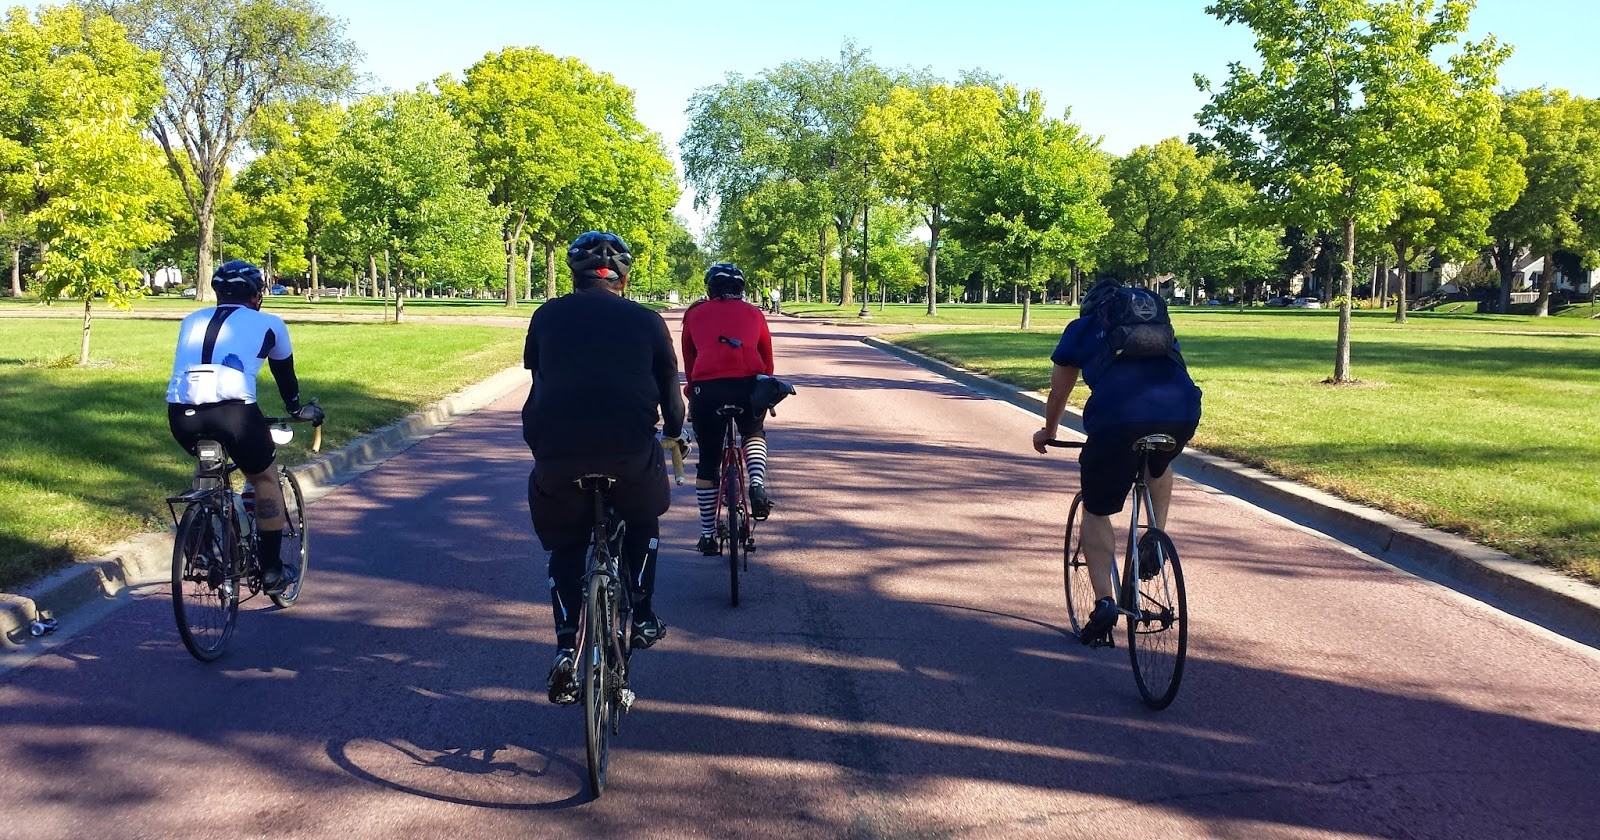 Bike buddy's: o começo da aventura urbana